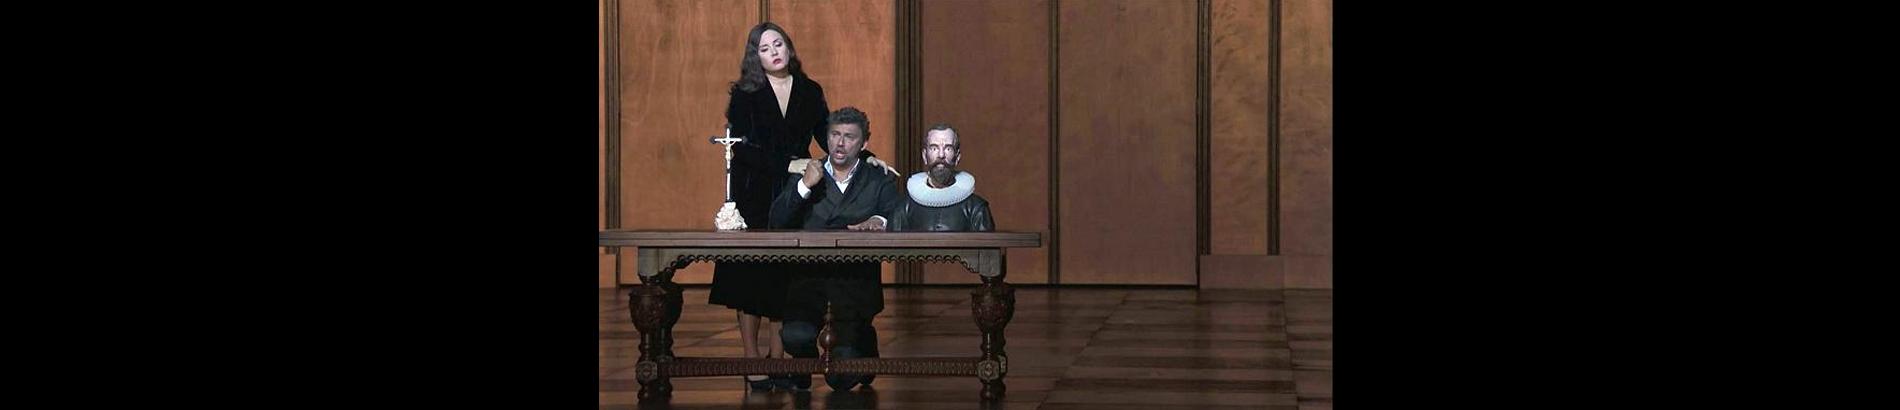 Kaufmann and Yoncheva star in Verdi's Don Carlos